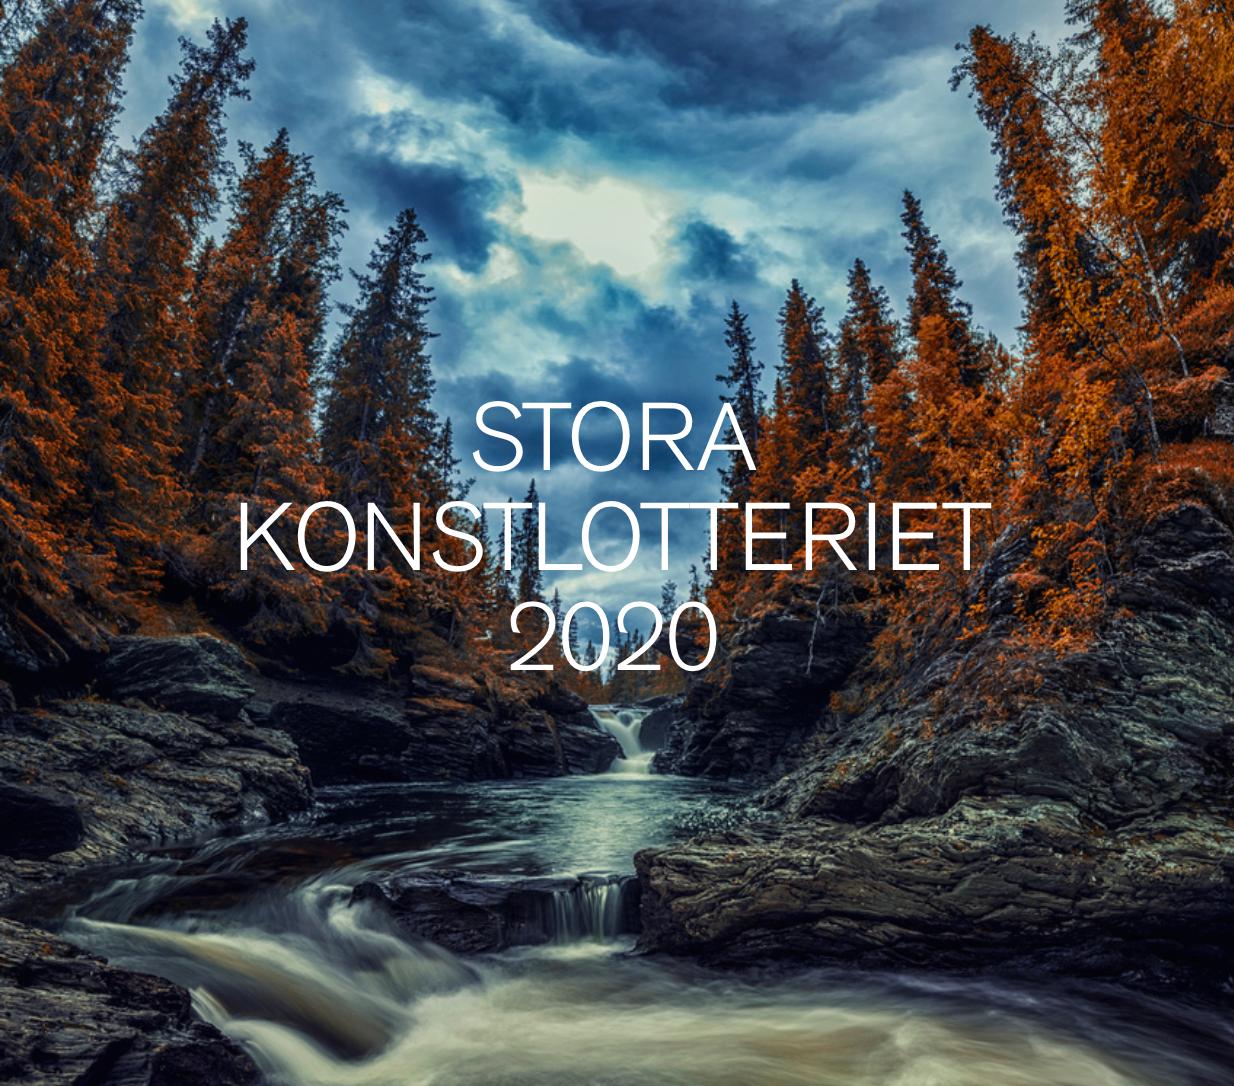 Stora Konstlotteriet 2020